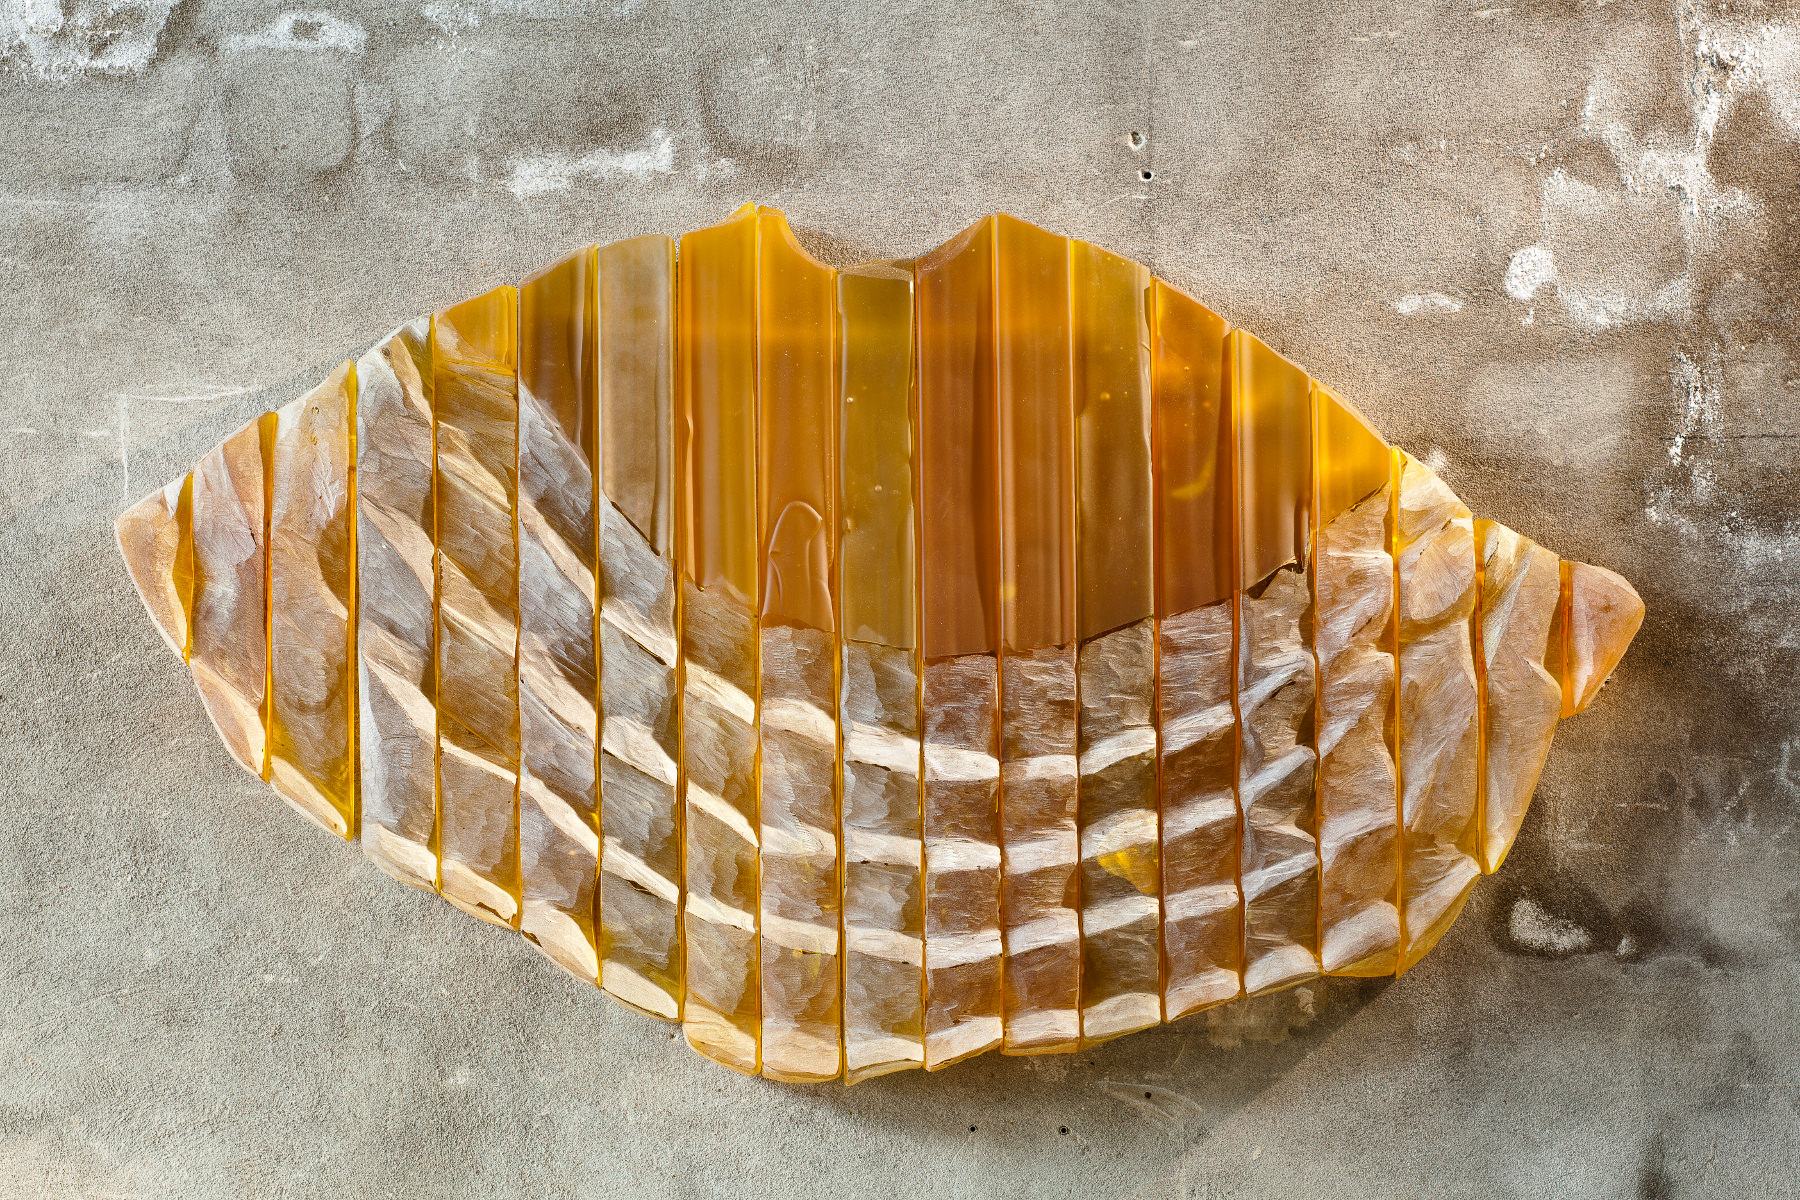 Ursula Von Rydingsvard's Glass Corrugated